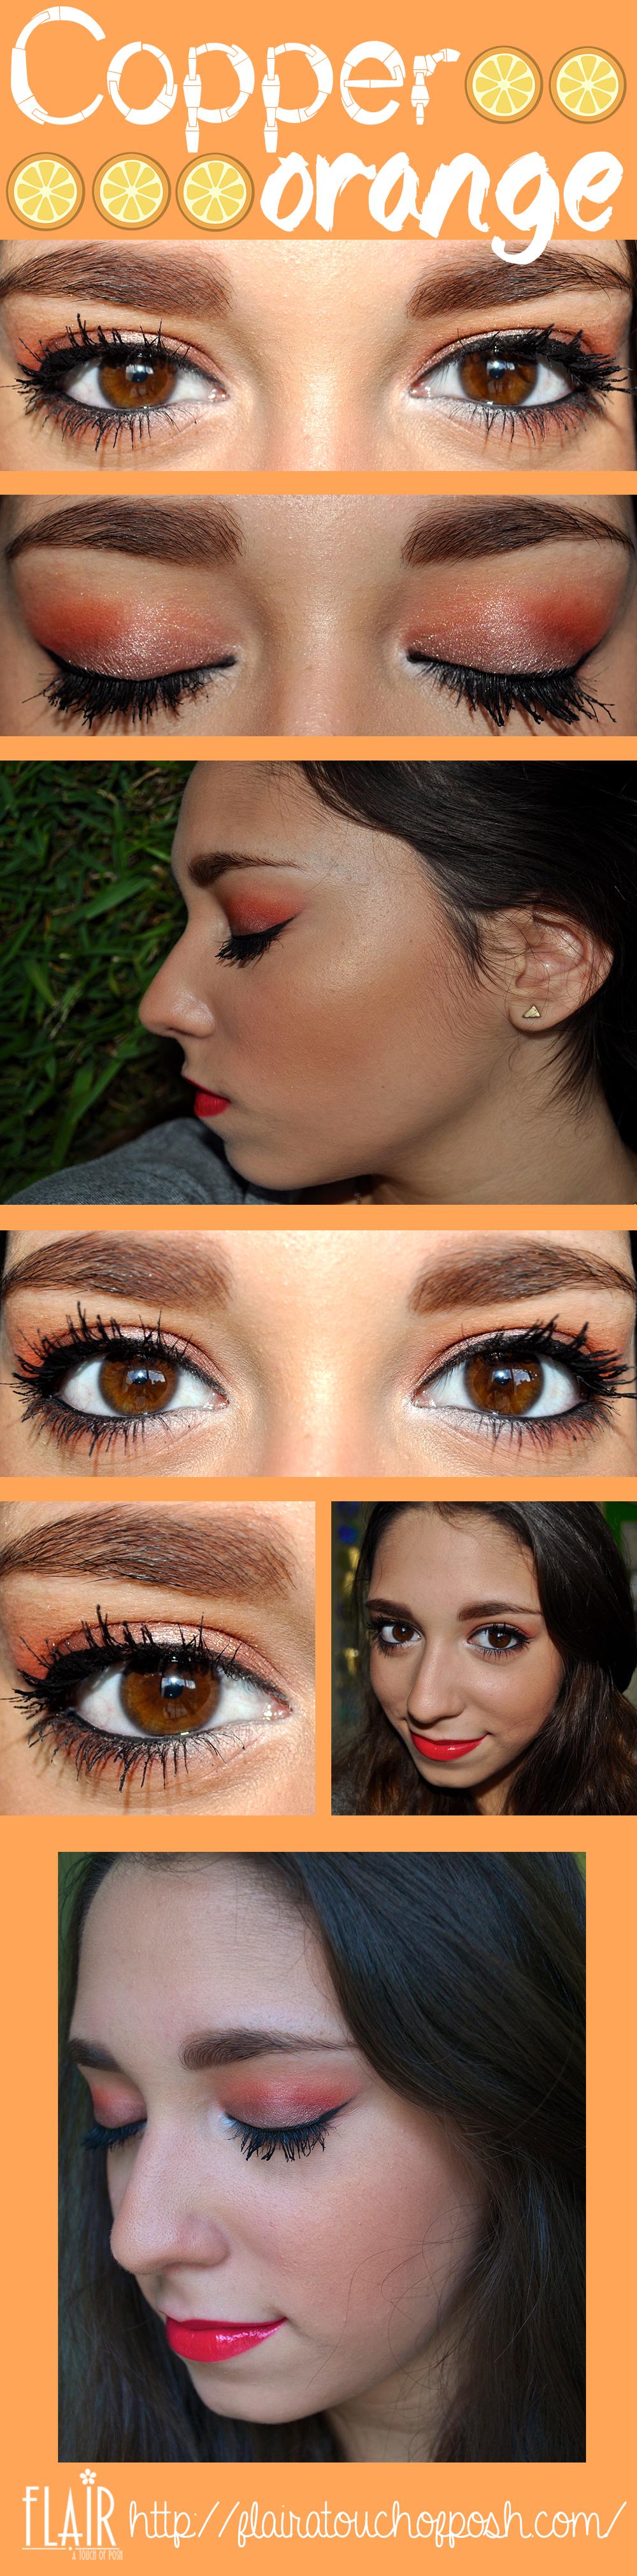 Copper orange1.png